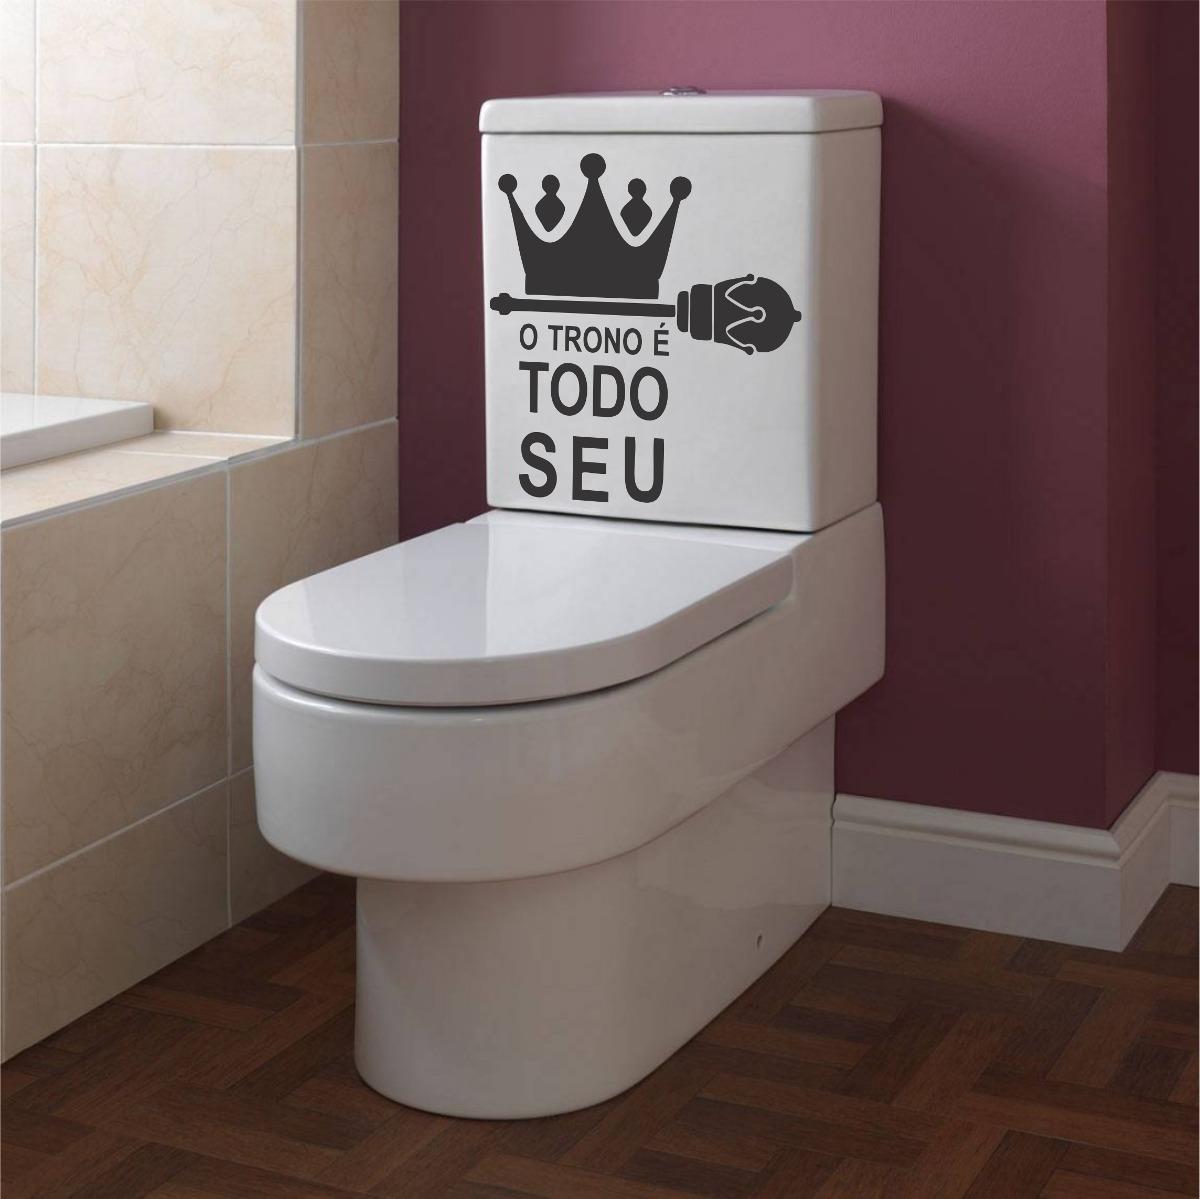 adesivos decorativos para banheiro 1